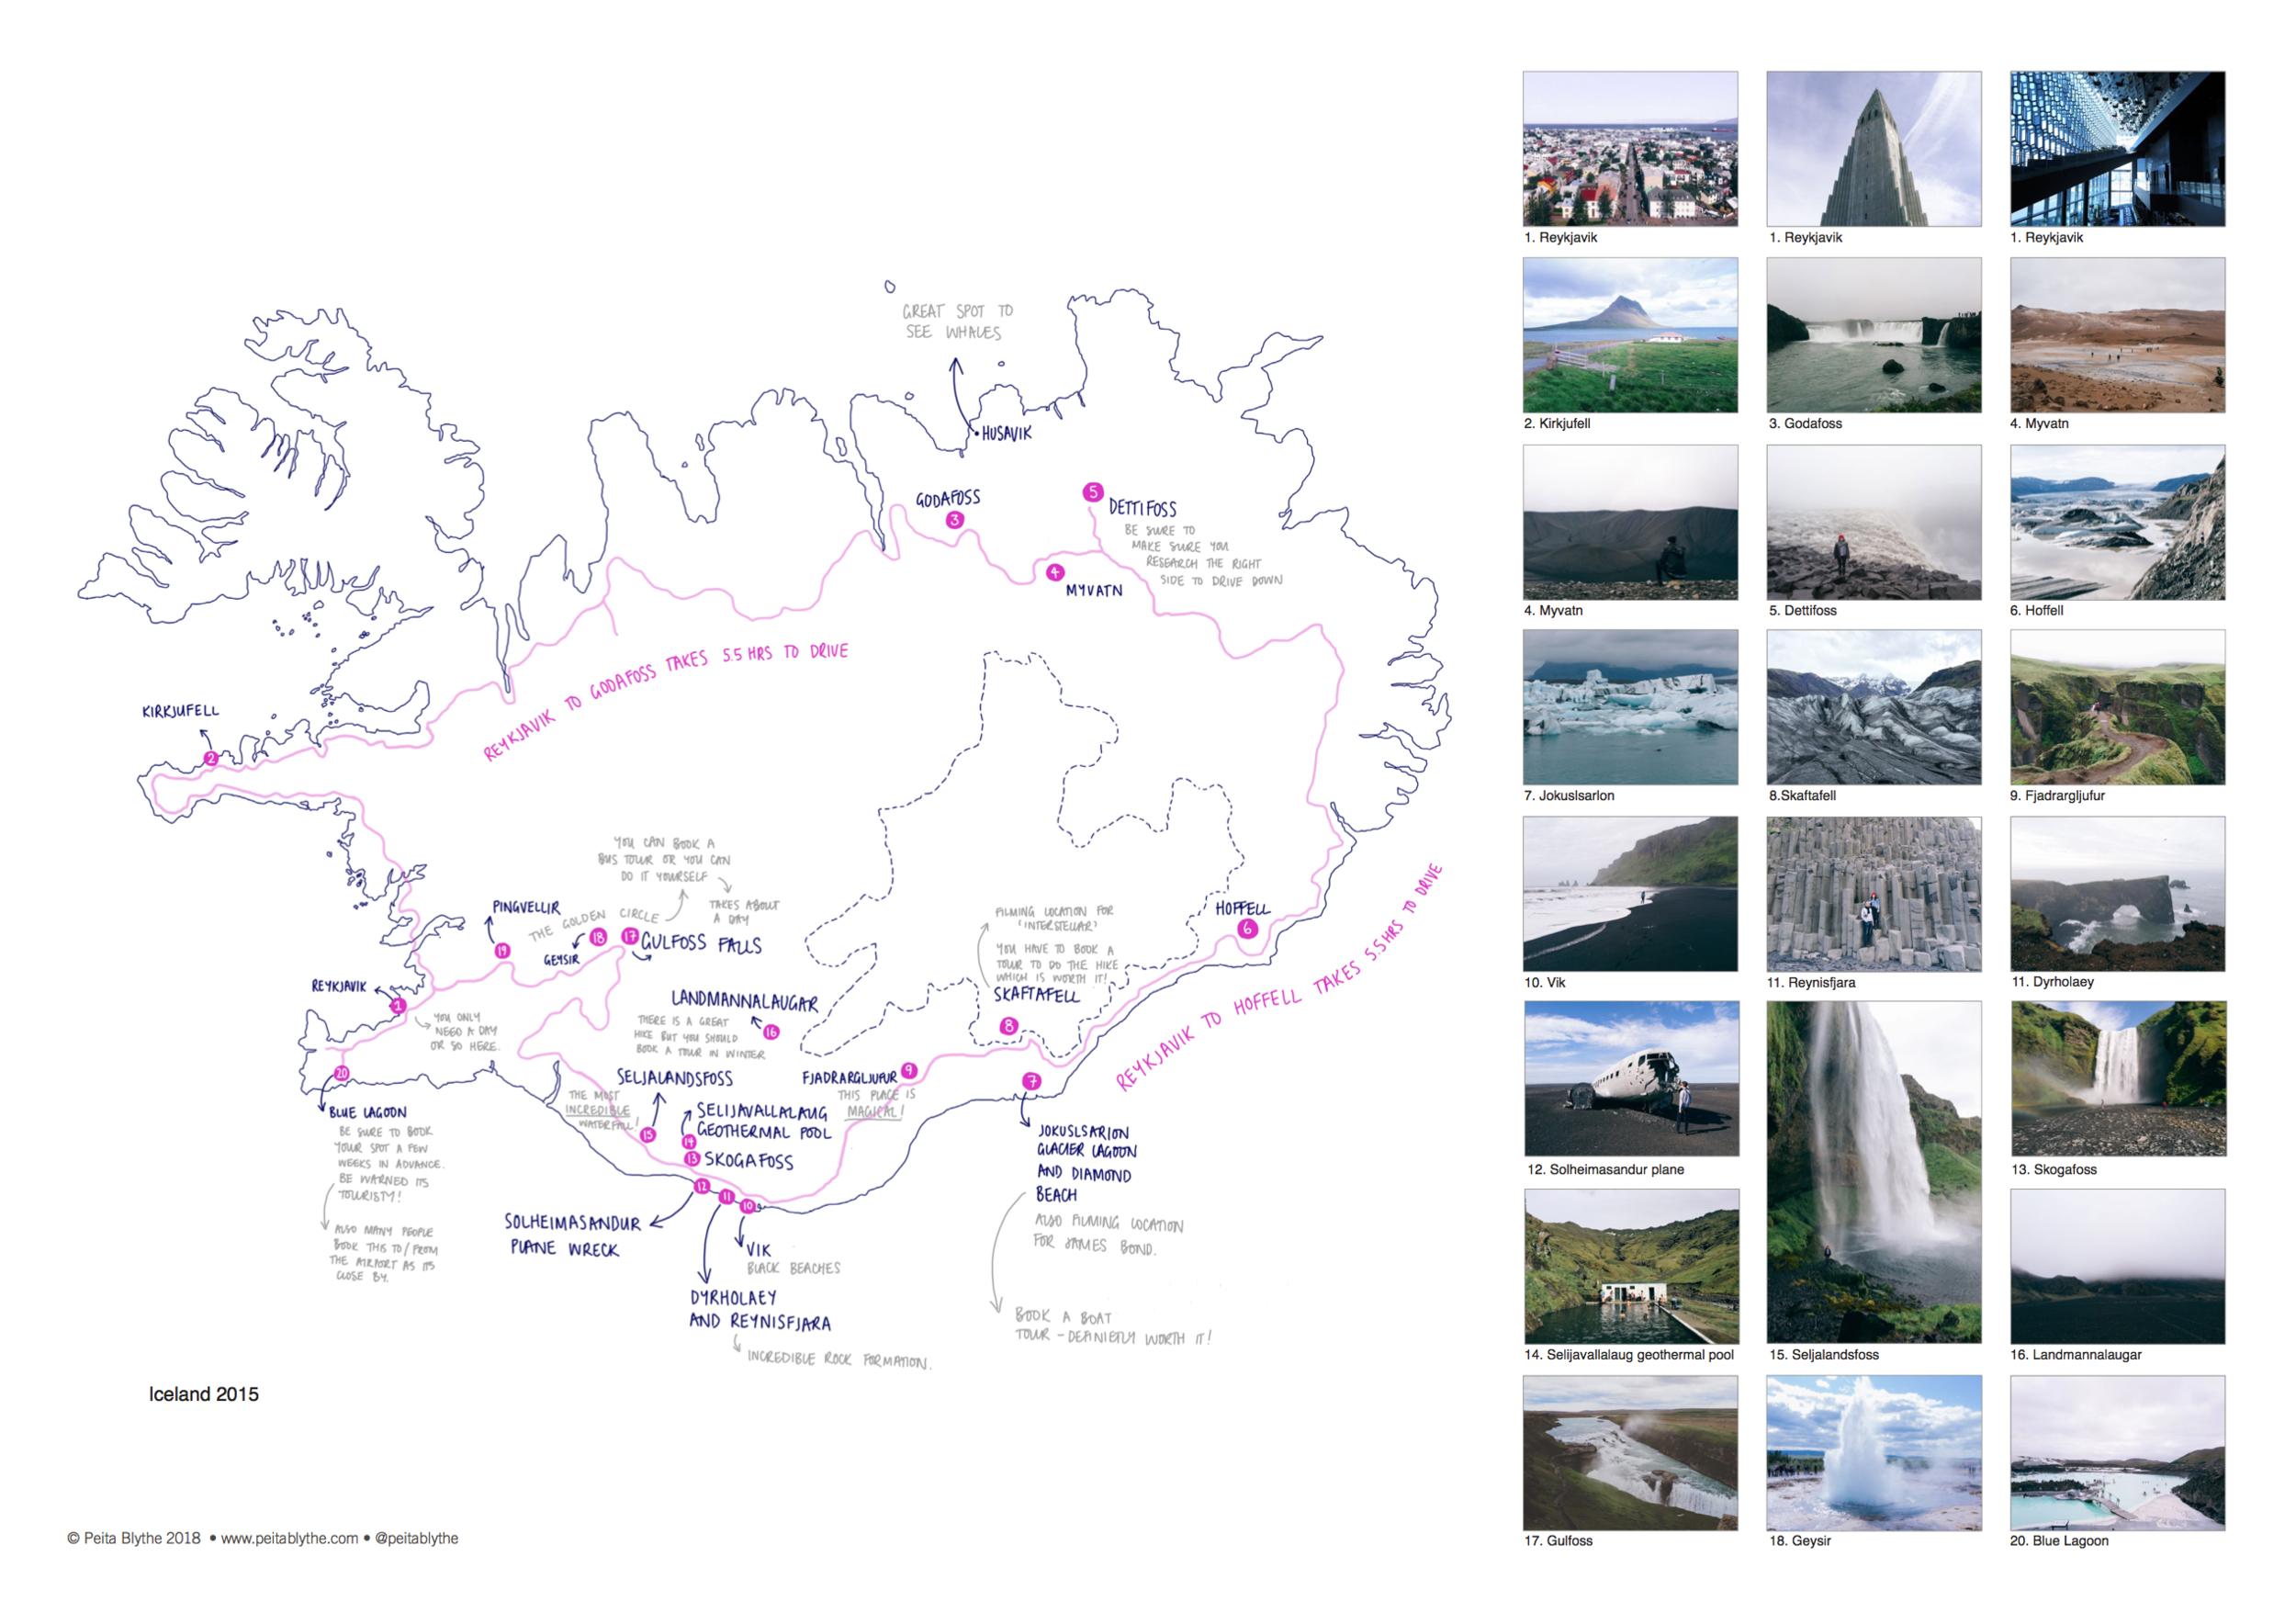 Iceland Map List — Peita Blythe on flag list, print list, queue list, shop list, food list, mexico states and capitals list, city list, faq list,